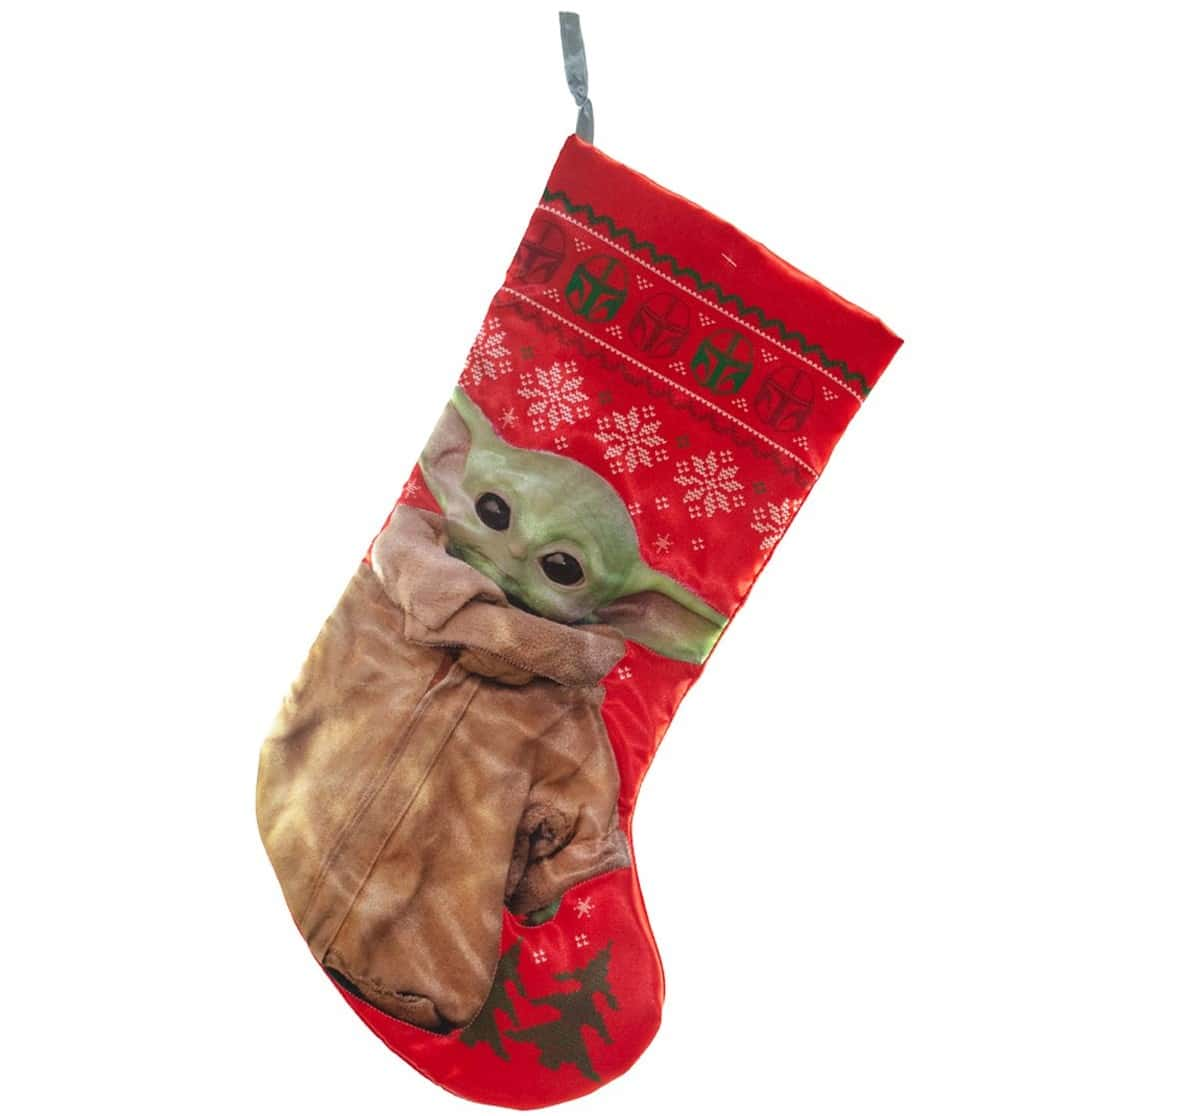 Baby Yoda Christmas stockings, nutcracker and snow globe make us feel like it's Christmas in June 14